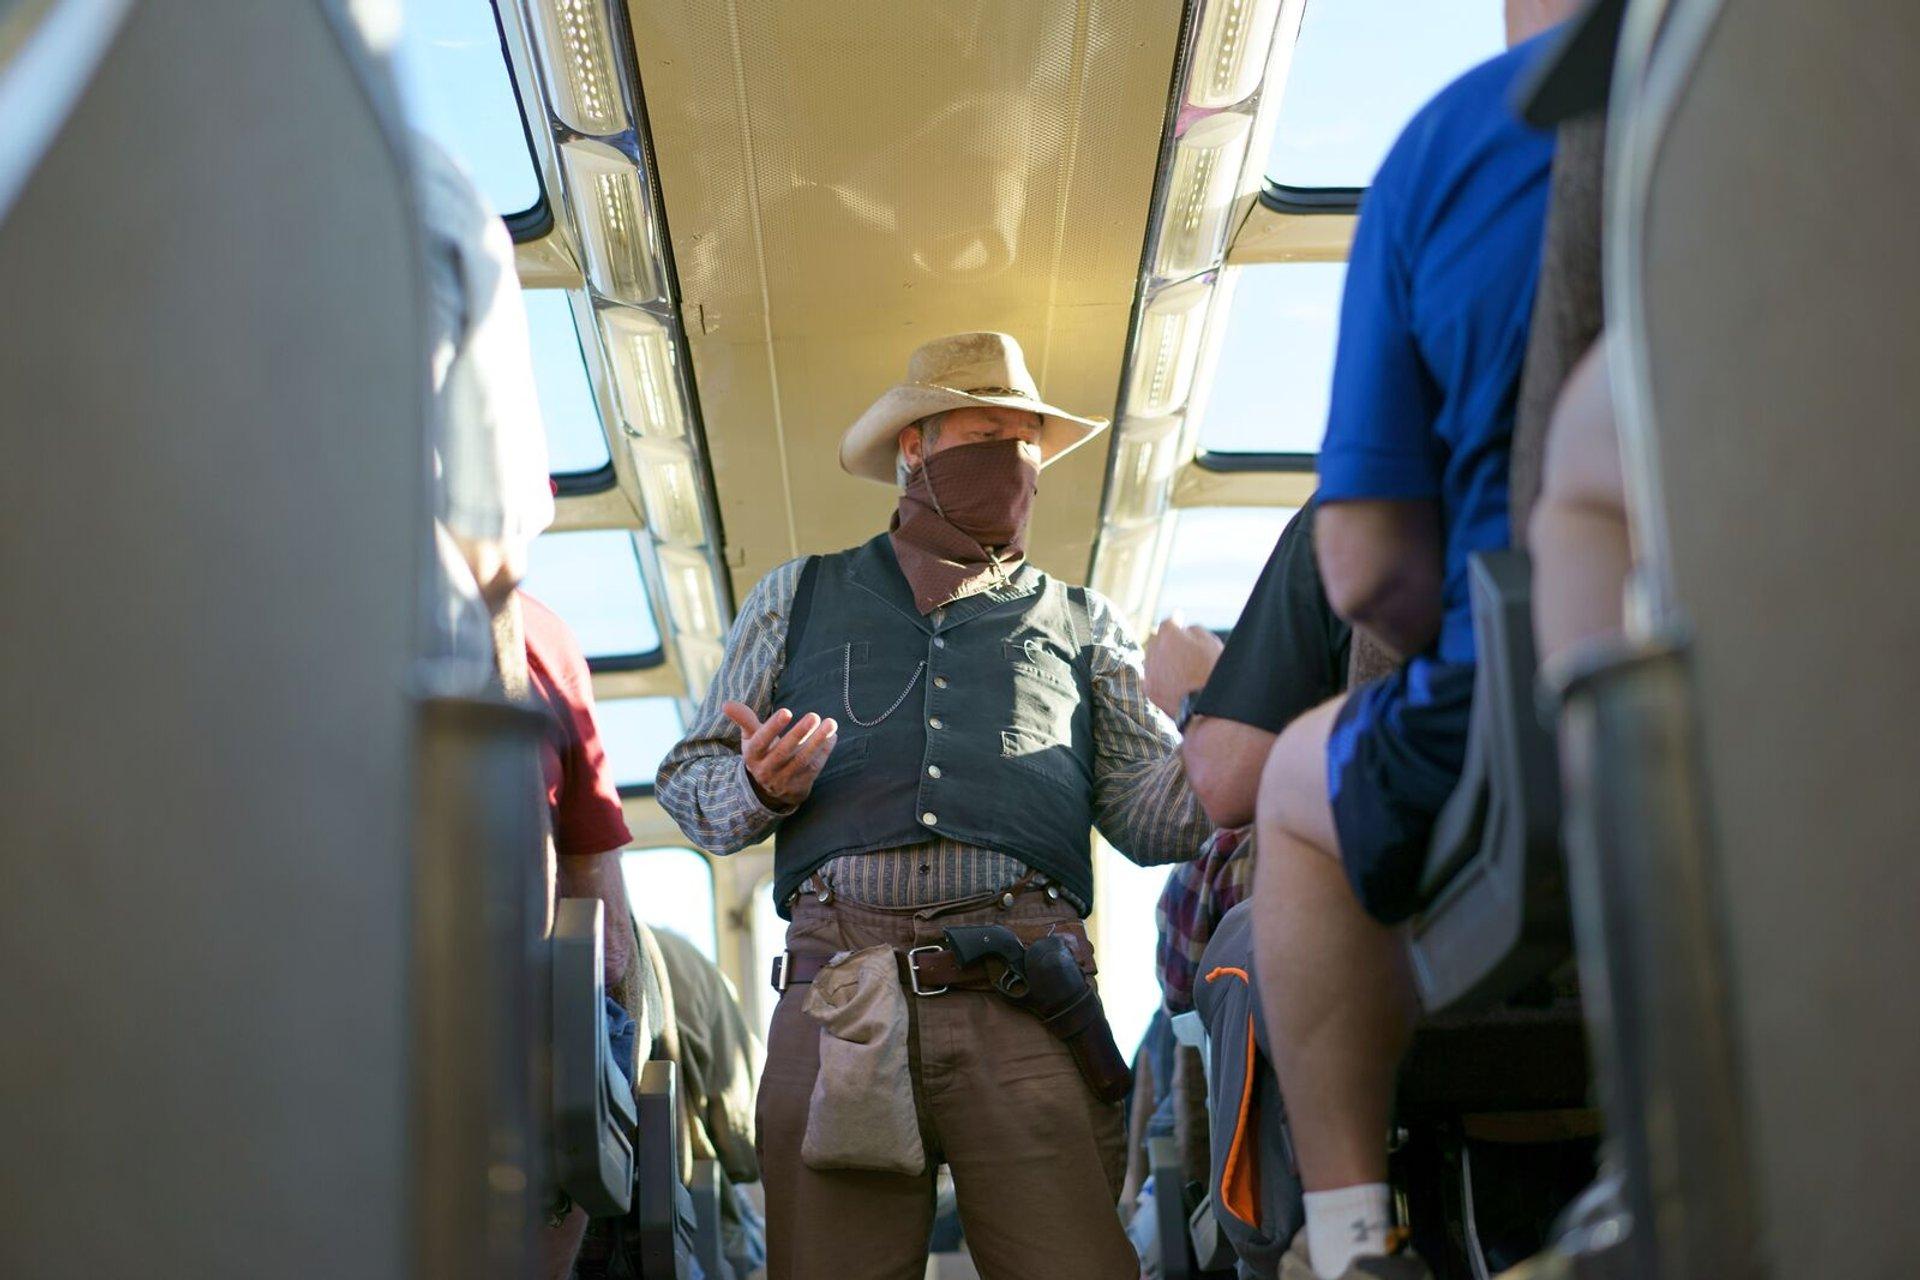 Cowboys on train 2020